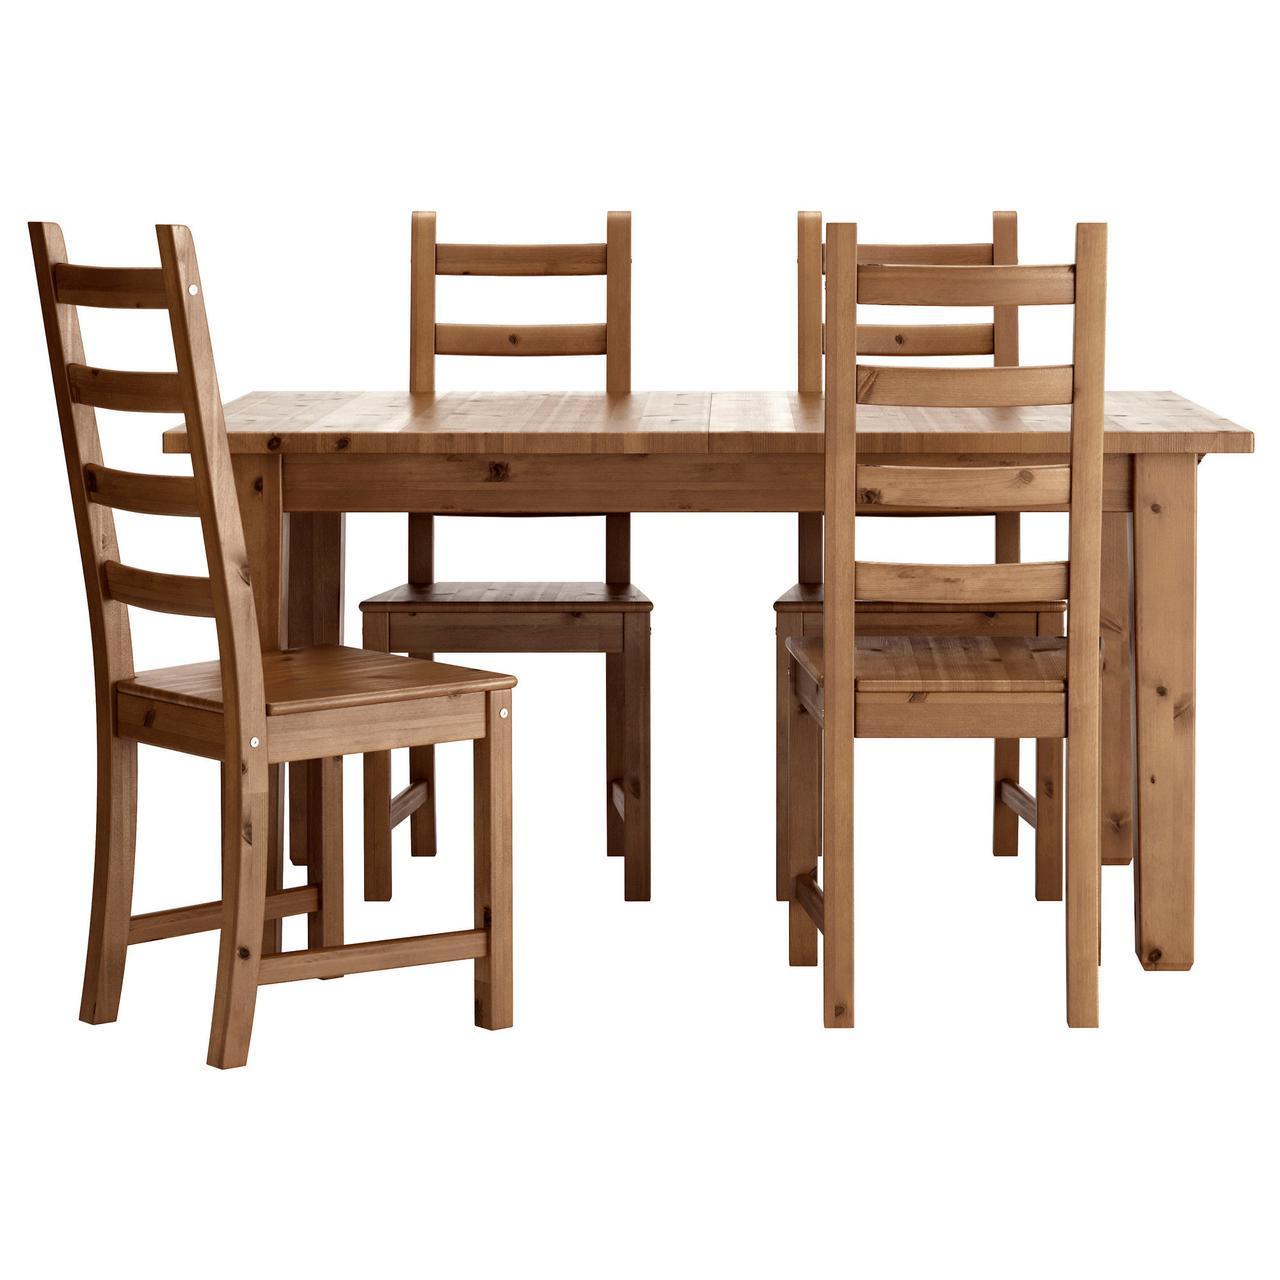 IKEA STORNAS / KAUSTBY (498.856.40) Стол и 4 стула, пятно патины